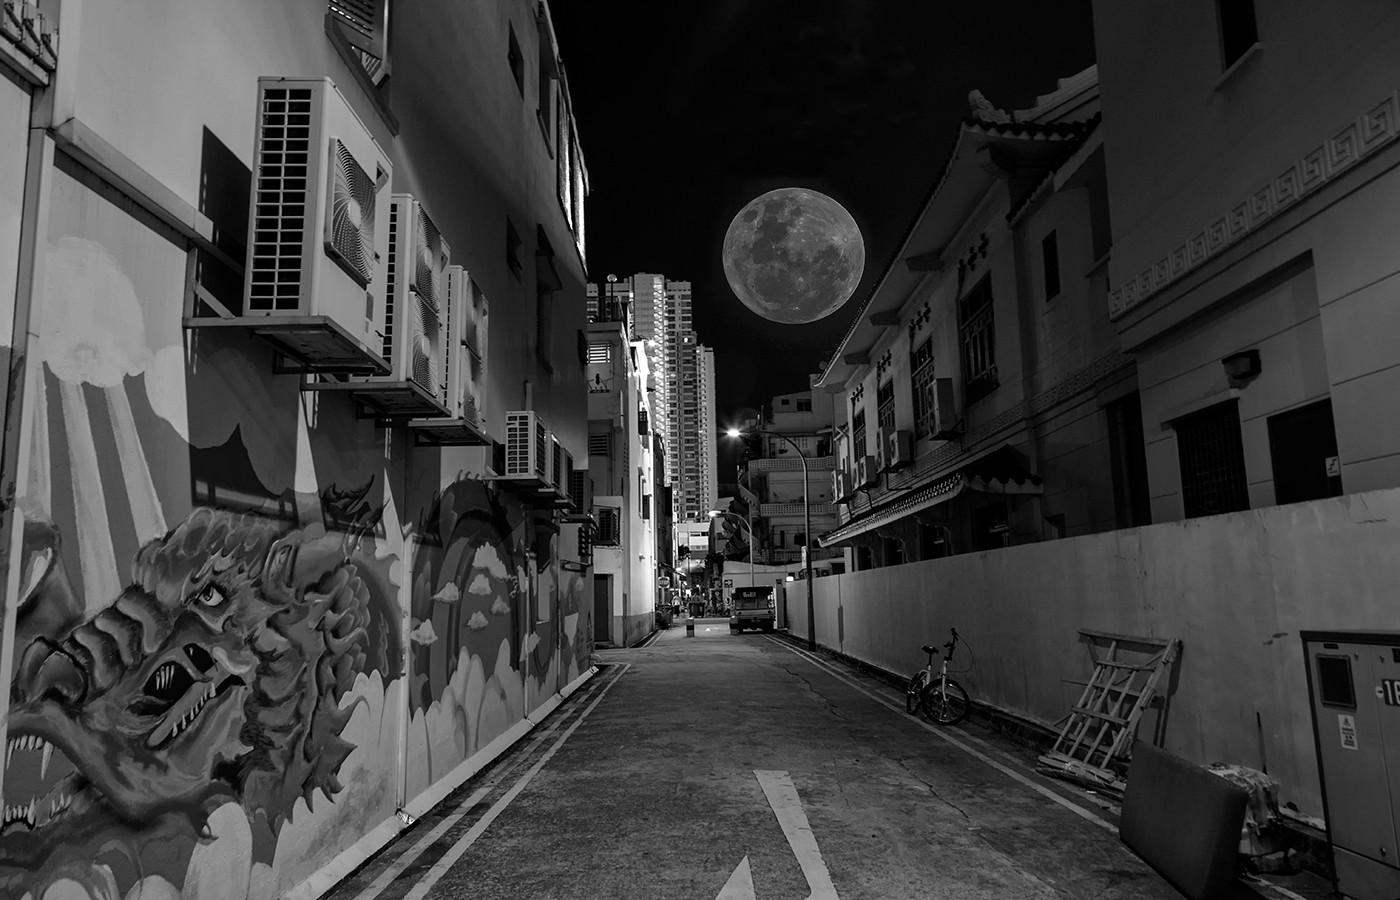 Margaret Kossowski - The moon in Singapore - HONOUR